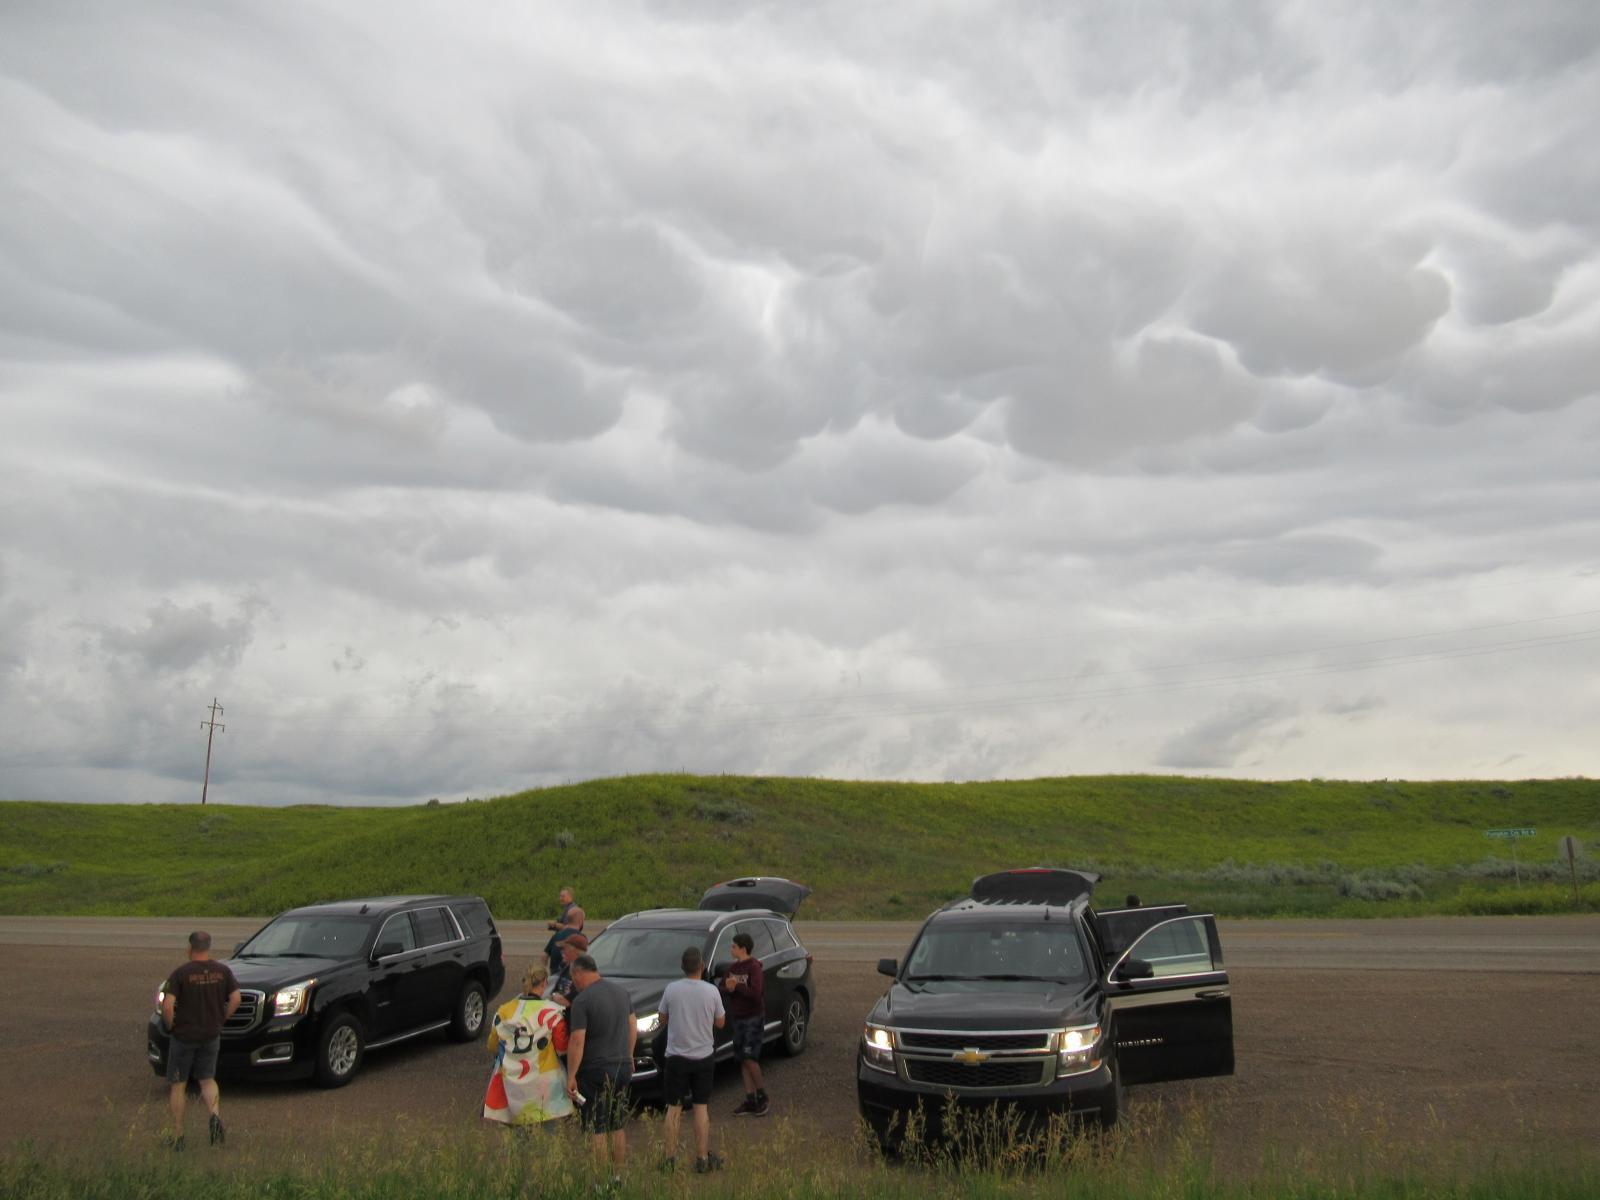 Storm Chasing cars Mammatus